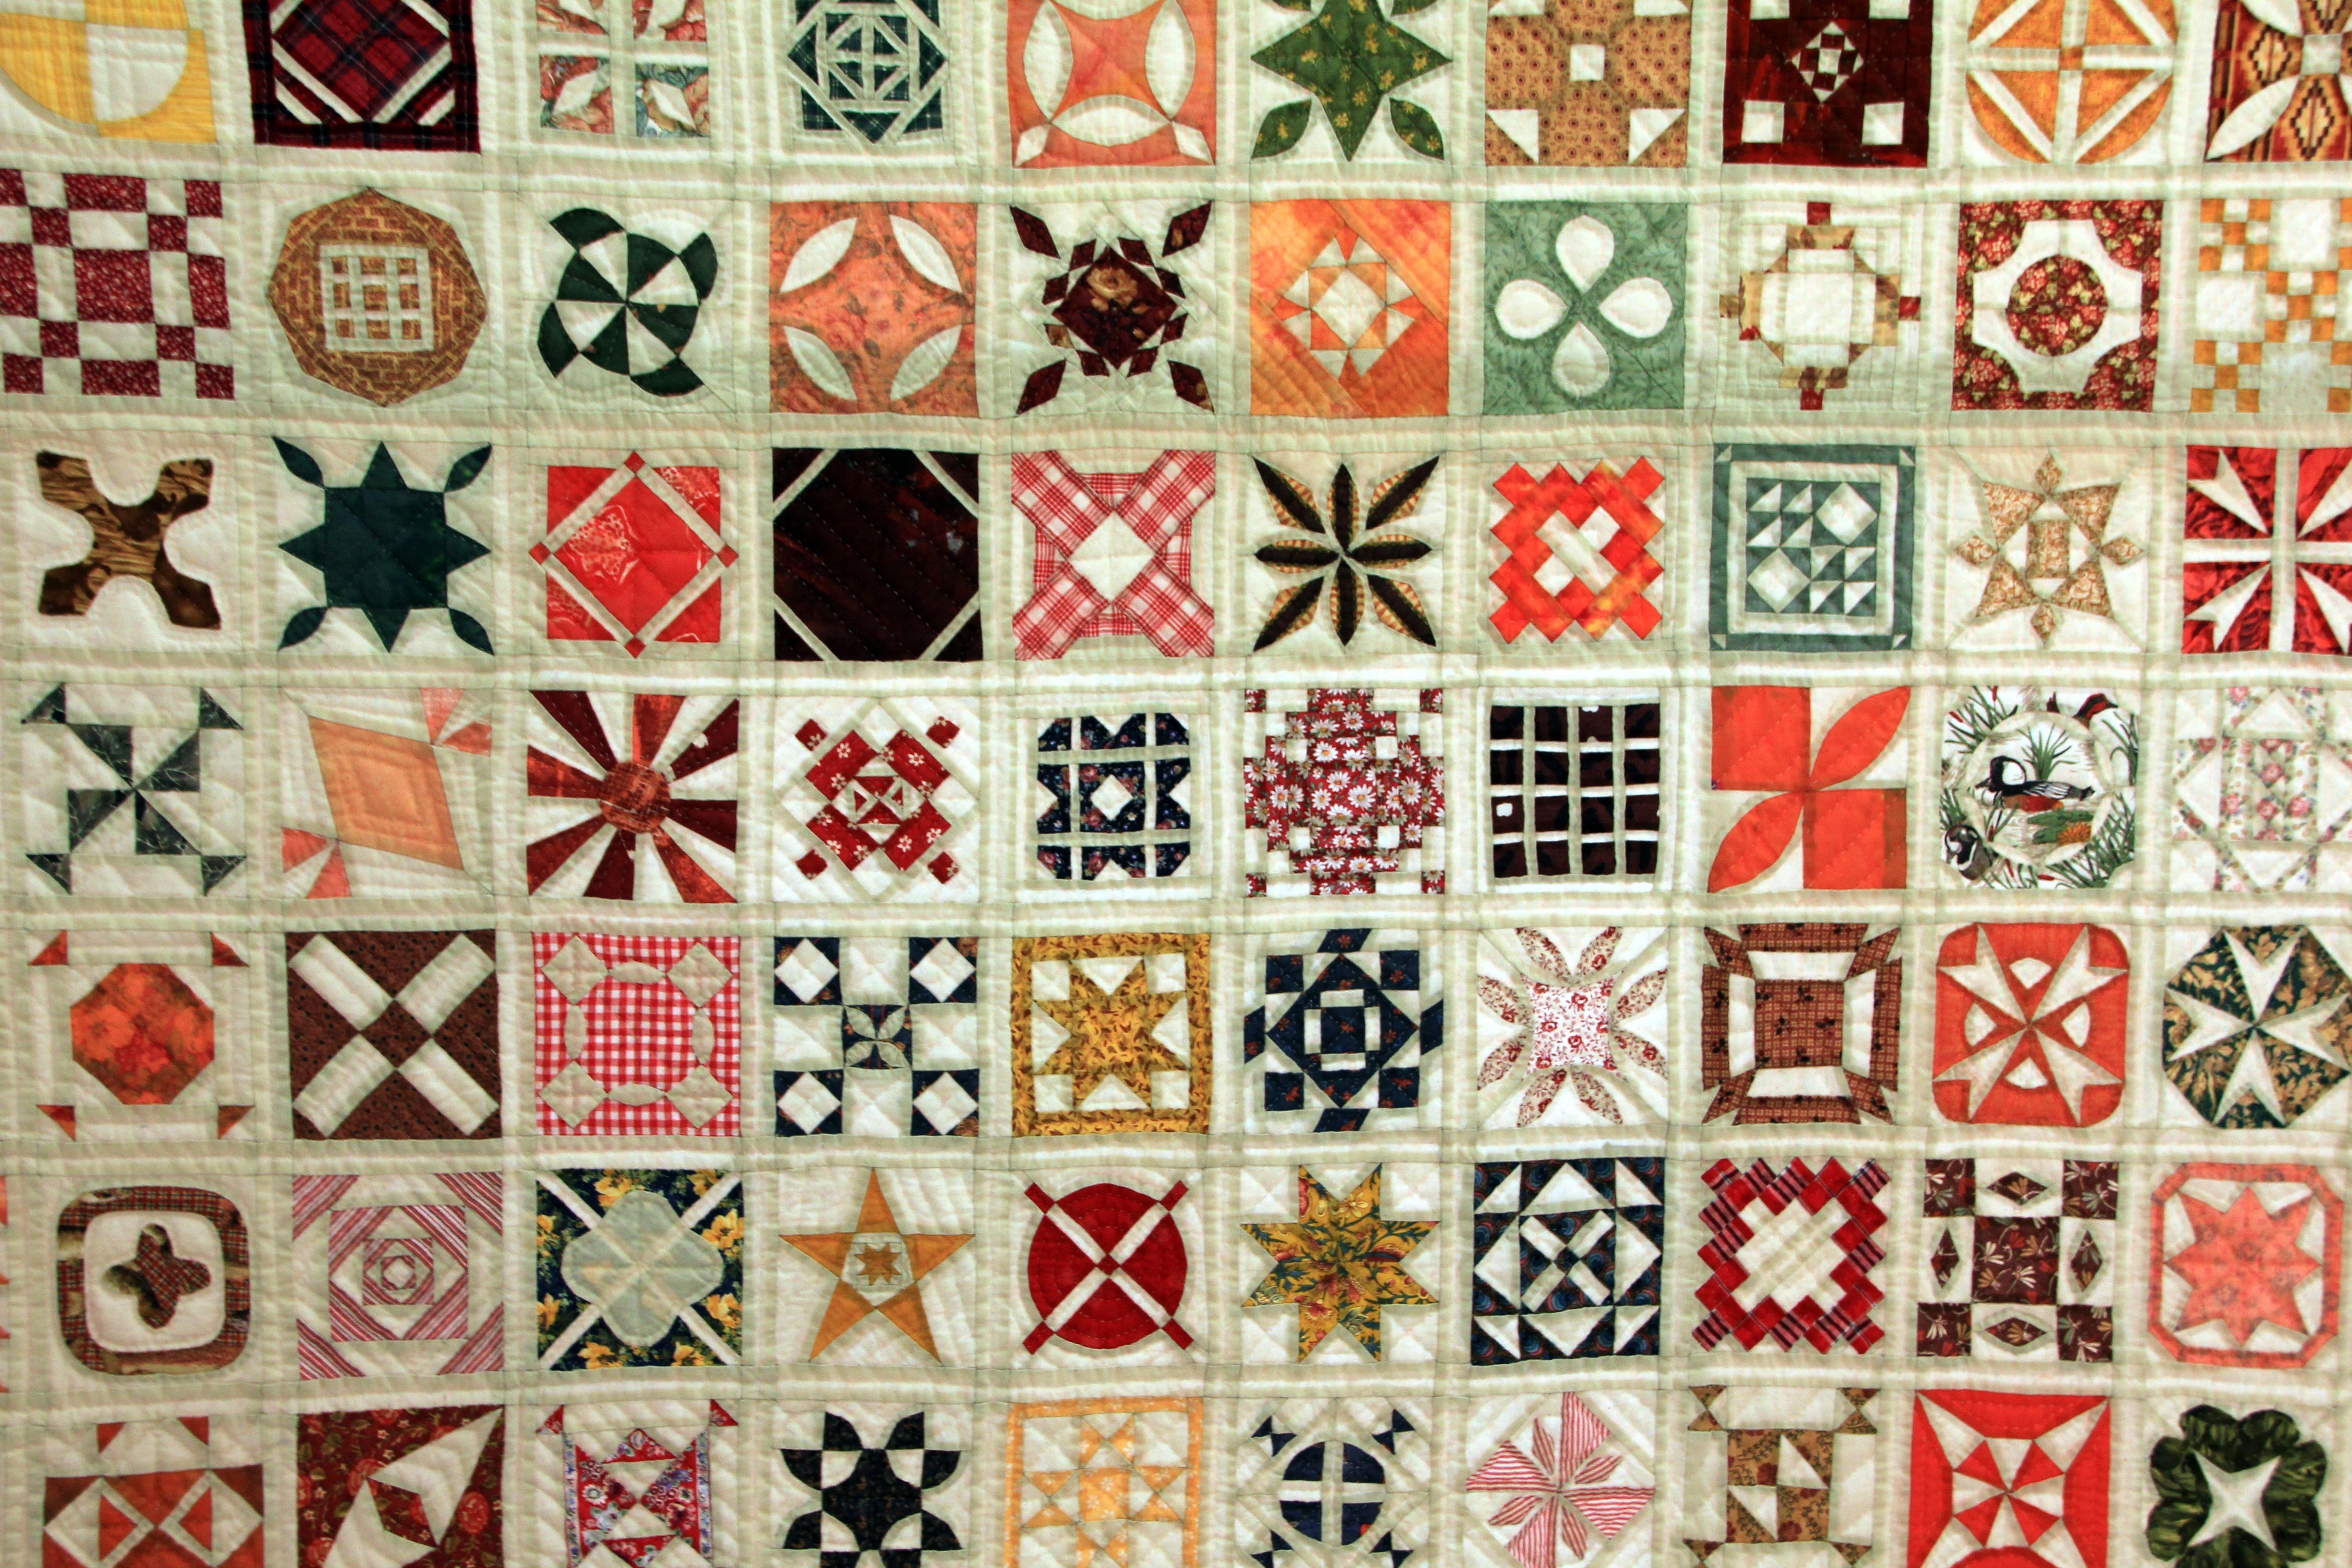 Kostenlose foto : Muster, Kunst, Material, Decke, nähen, Patchwork ...